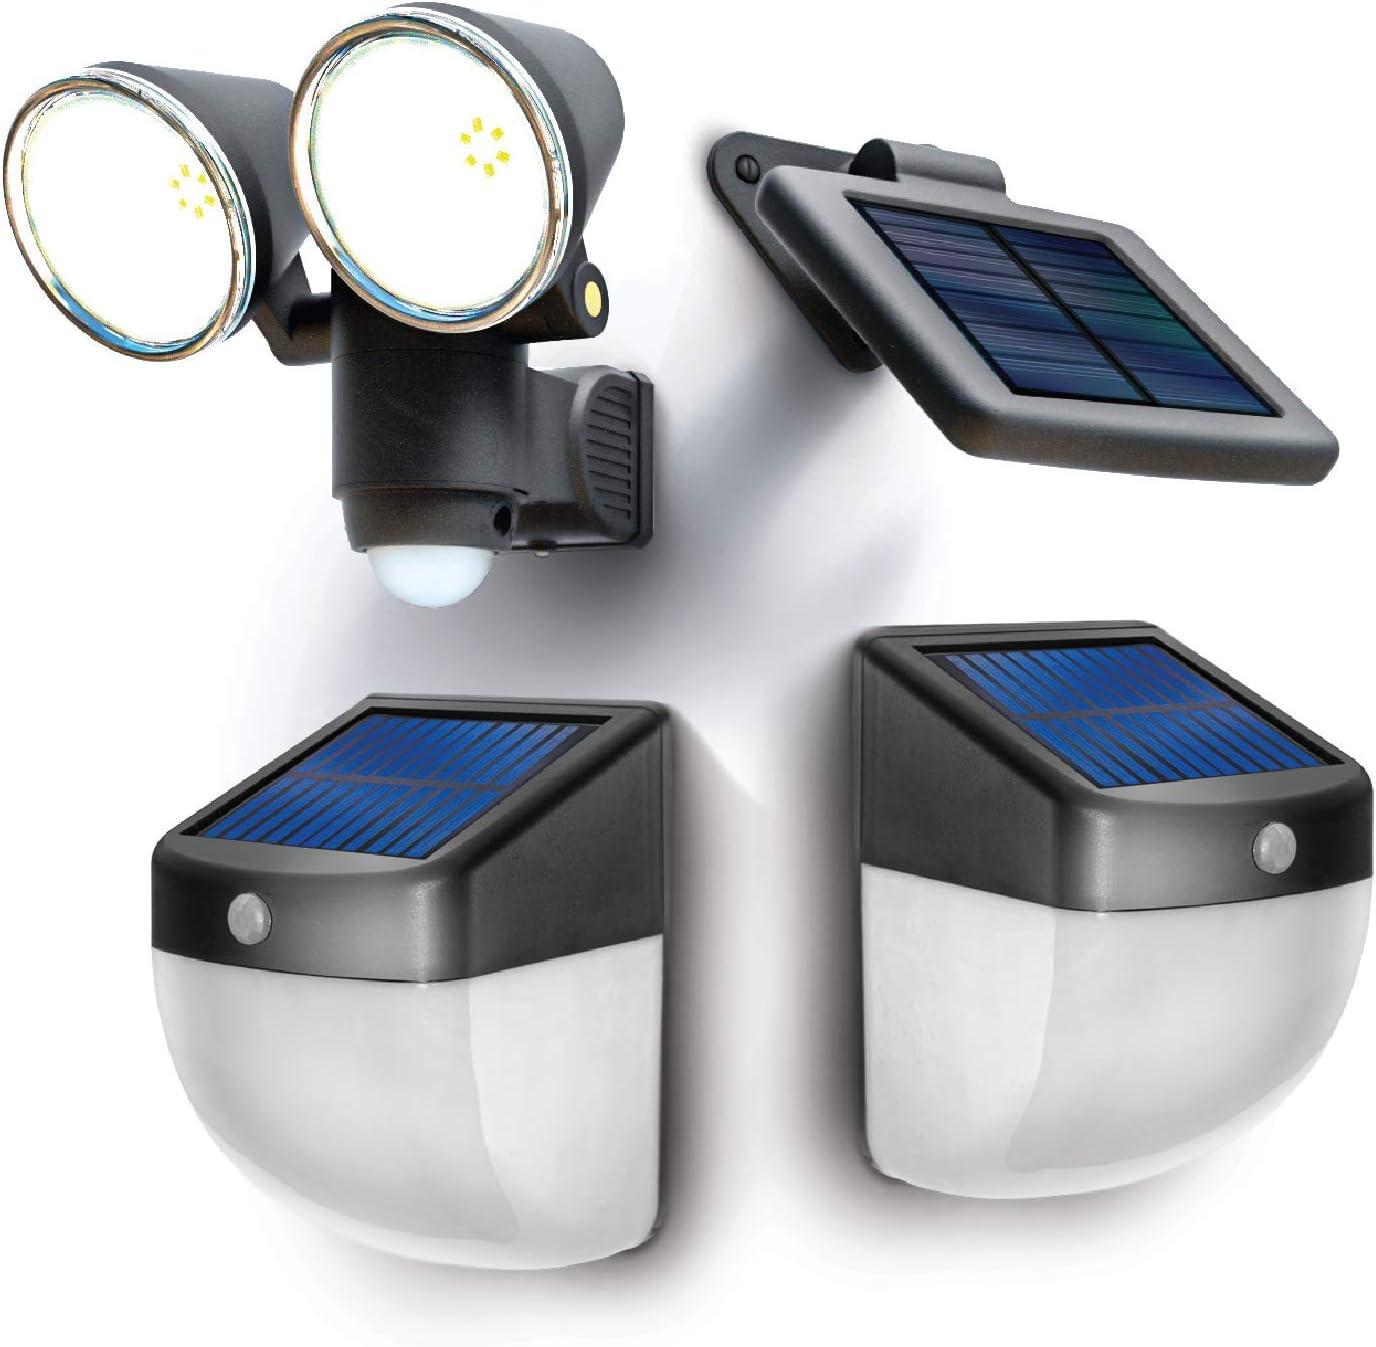 Home Zone Security Solar Wall Lights - Intelligent Solar Linkable Solar Motion Sensor Wall Lights (1-Set)